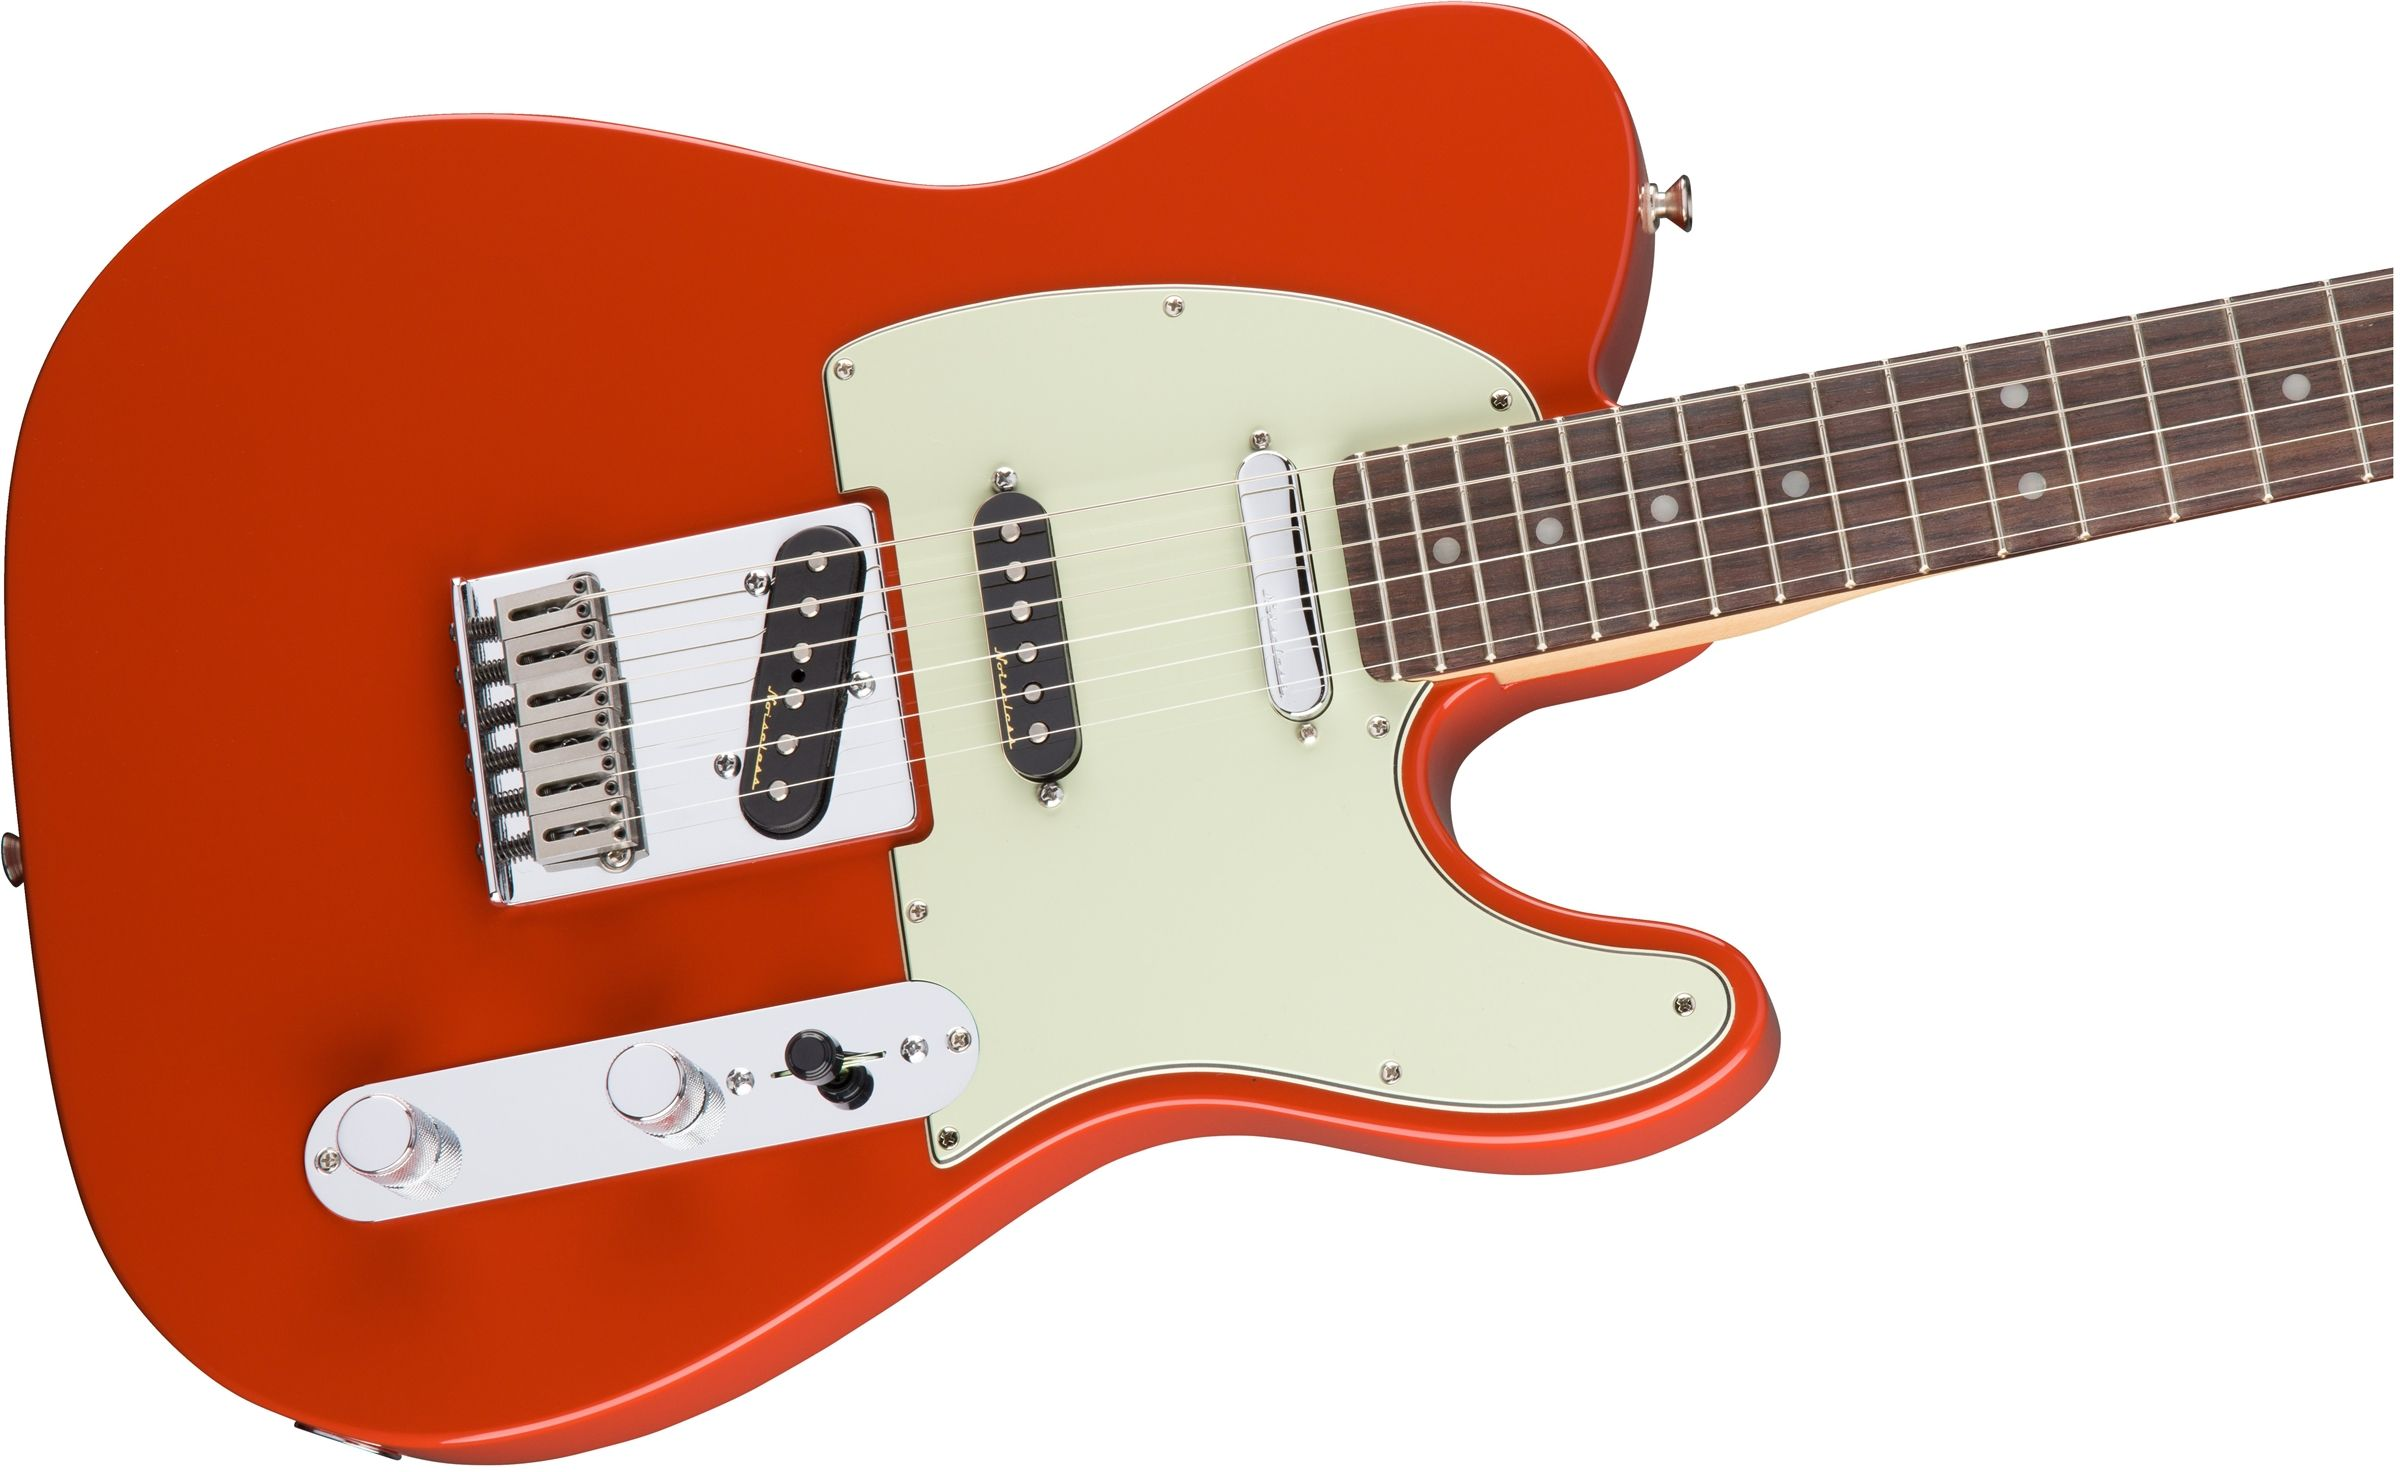 Fender 2016 Deluxe Nashville Telecaster Fiesta Red Rosewood Guitarras